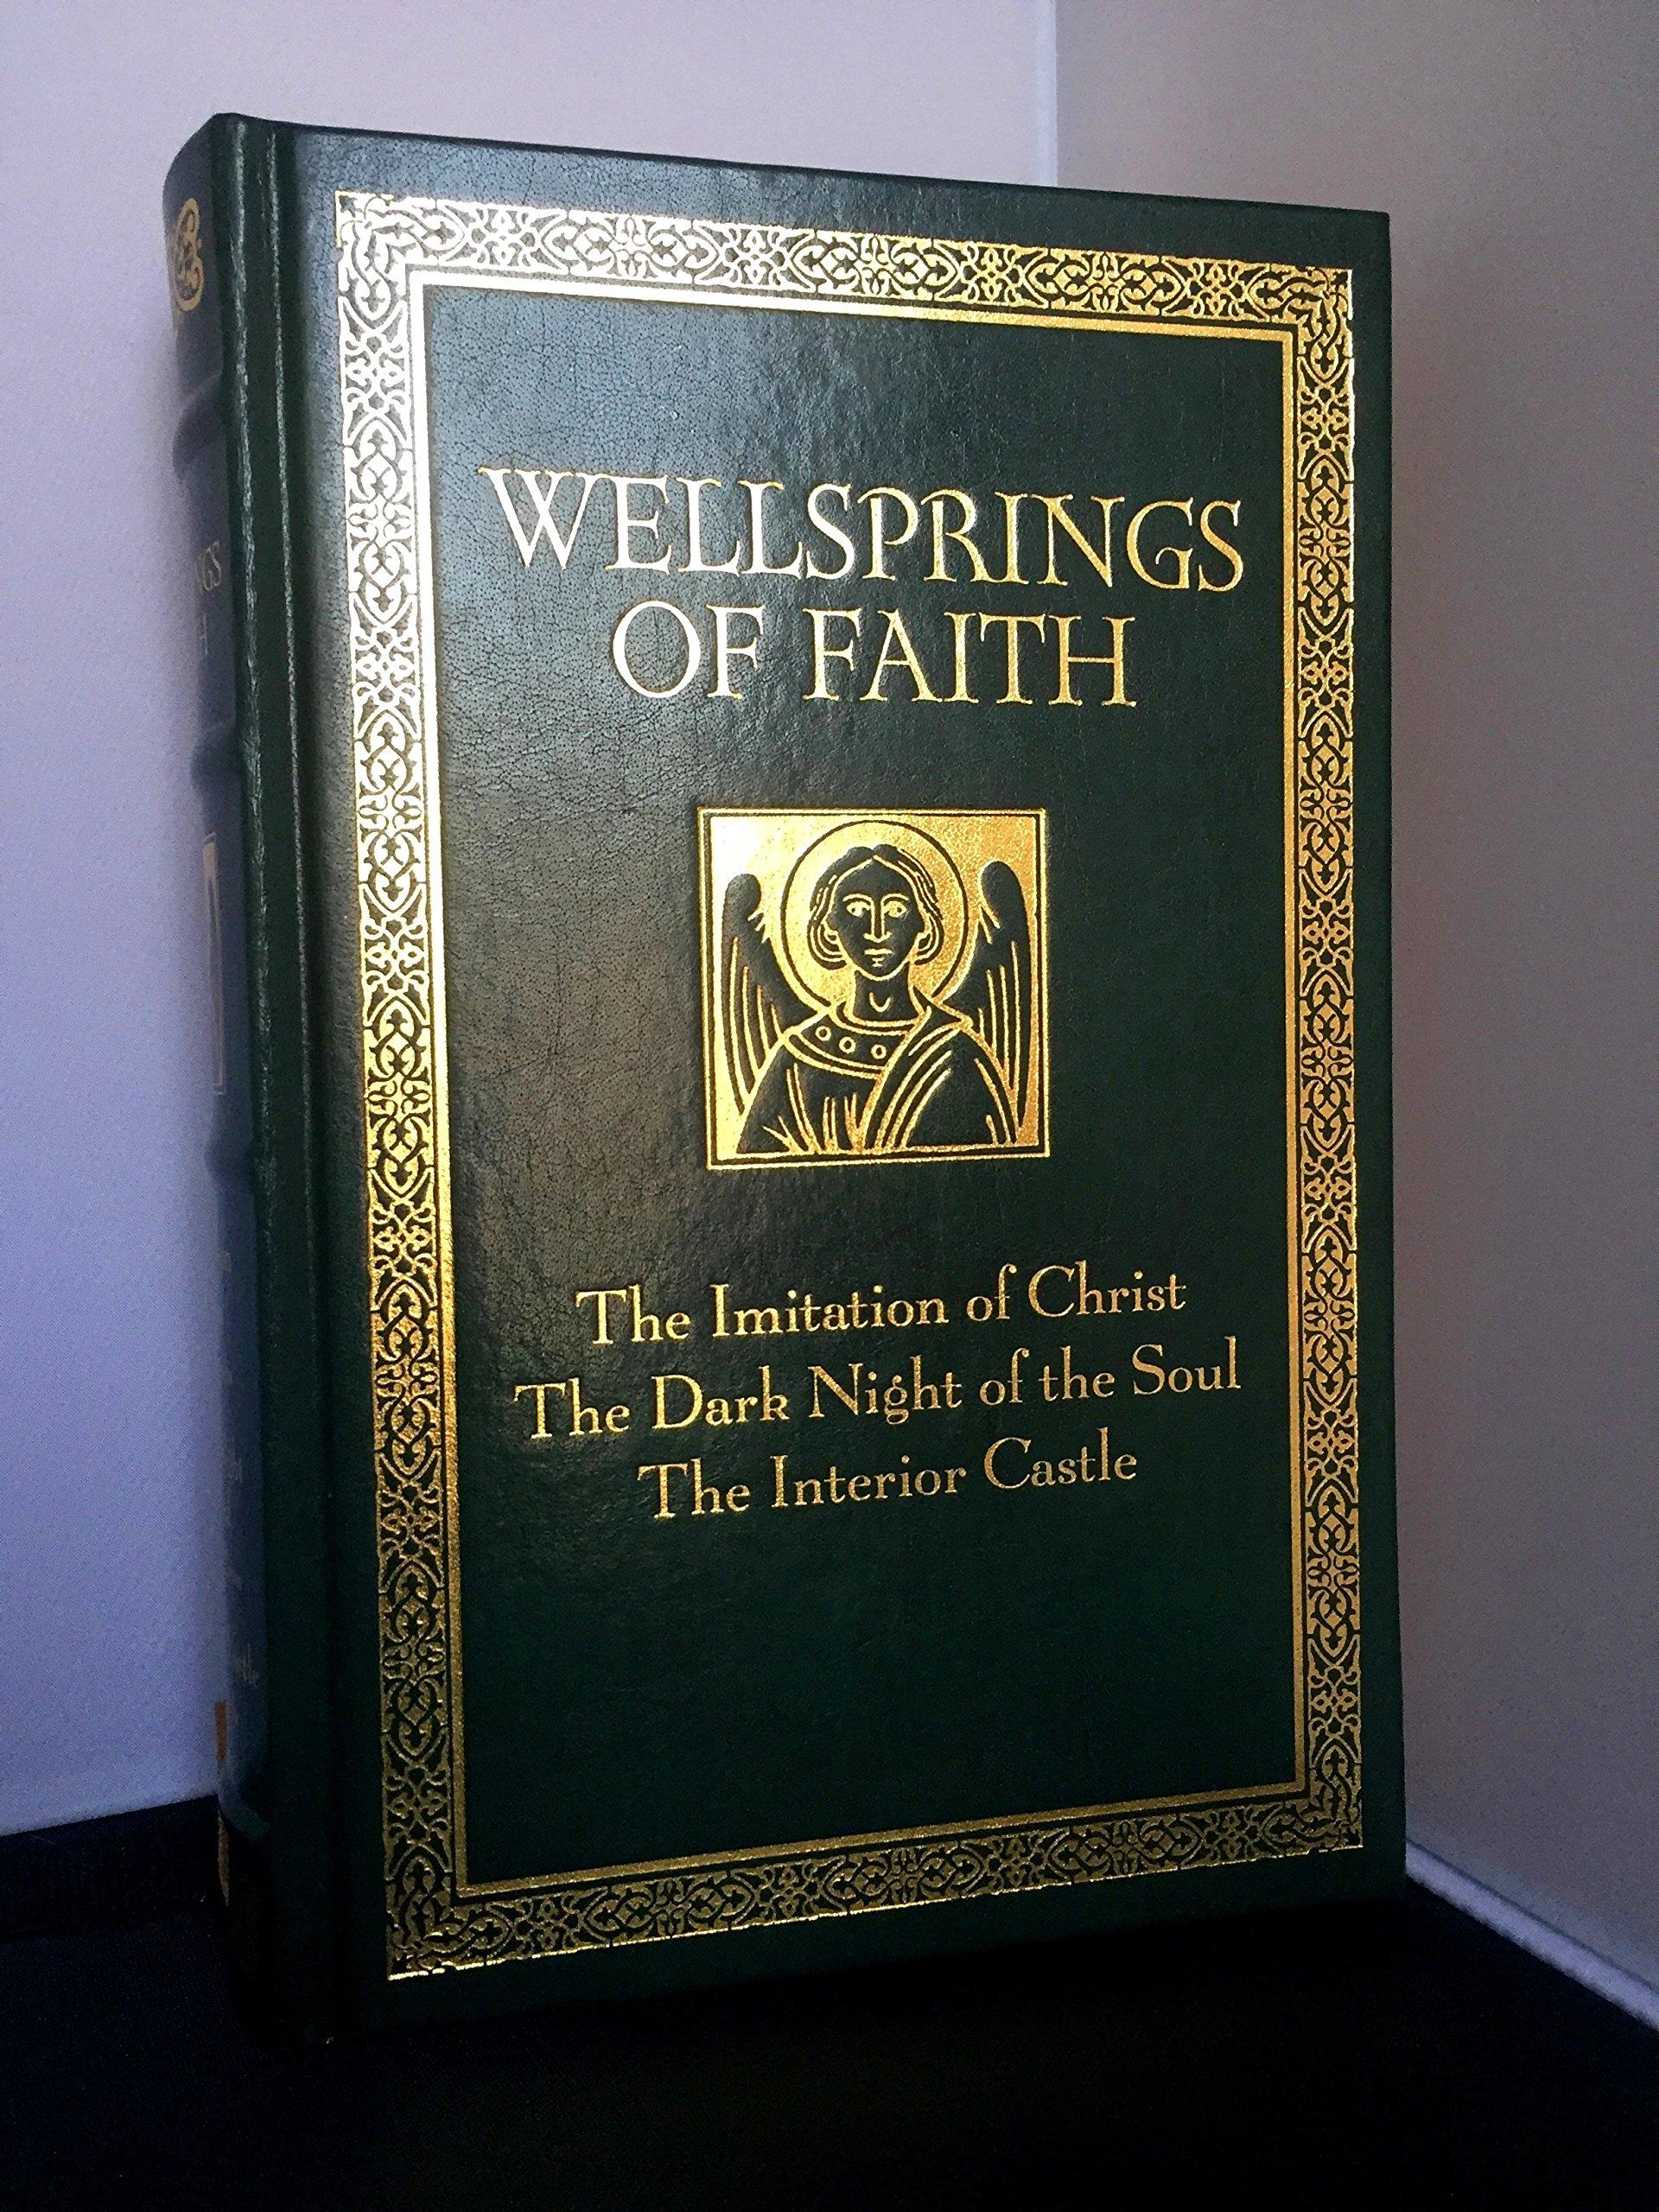 Wellsprings of Faith: The Imitation of Christ / The Dark Night of the Soul  / The Interior Castle: Thomas a Kempis, St.John of the Cross, St.Teresa of  Avila: ...